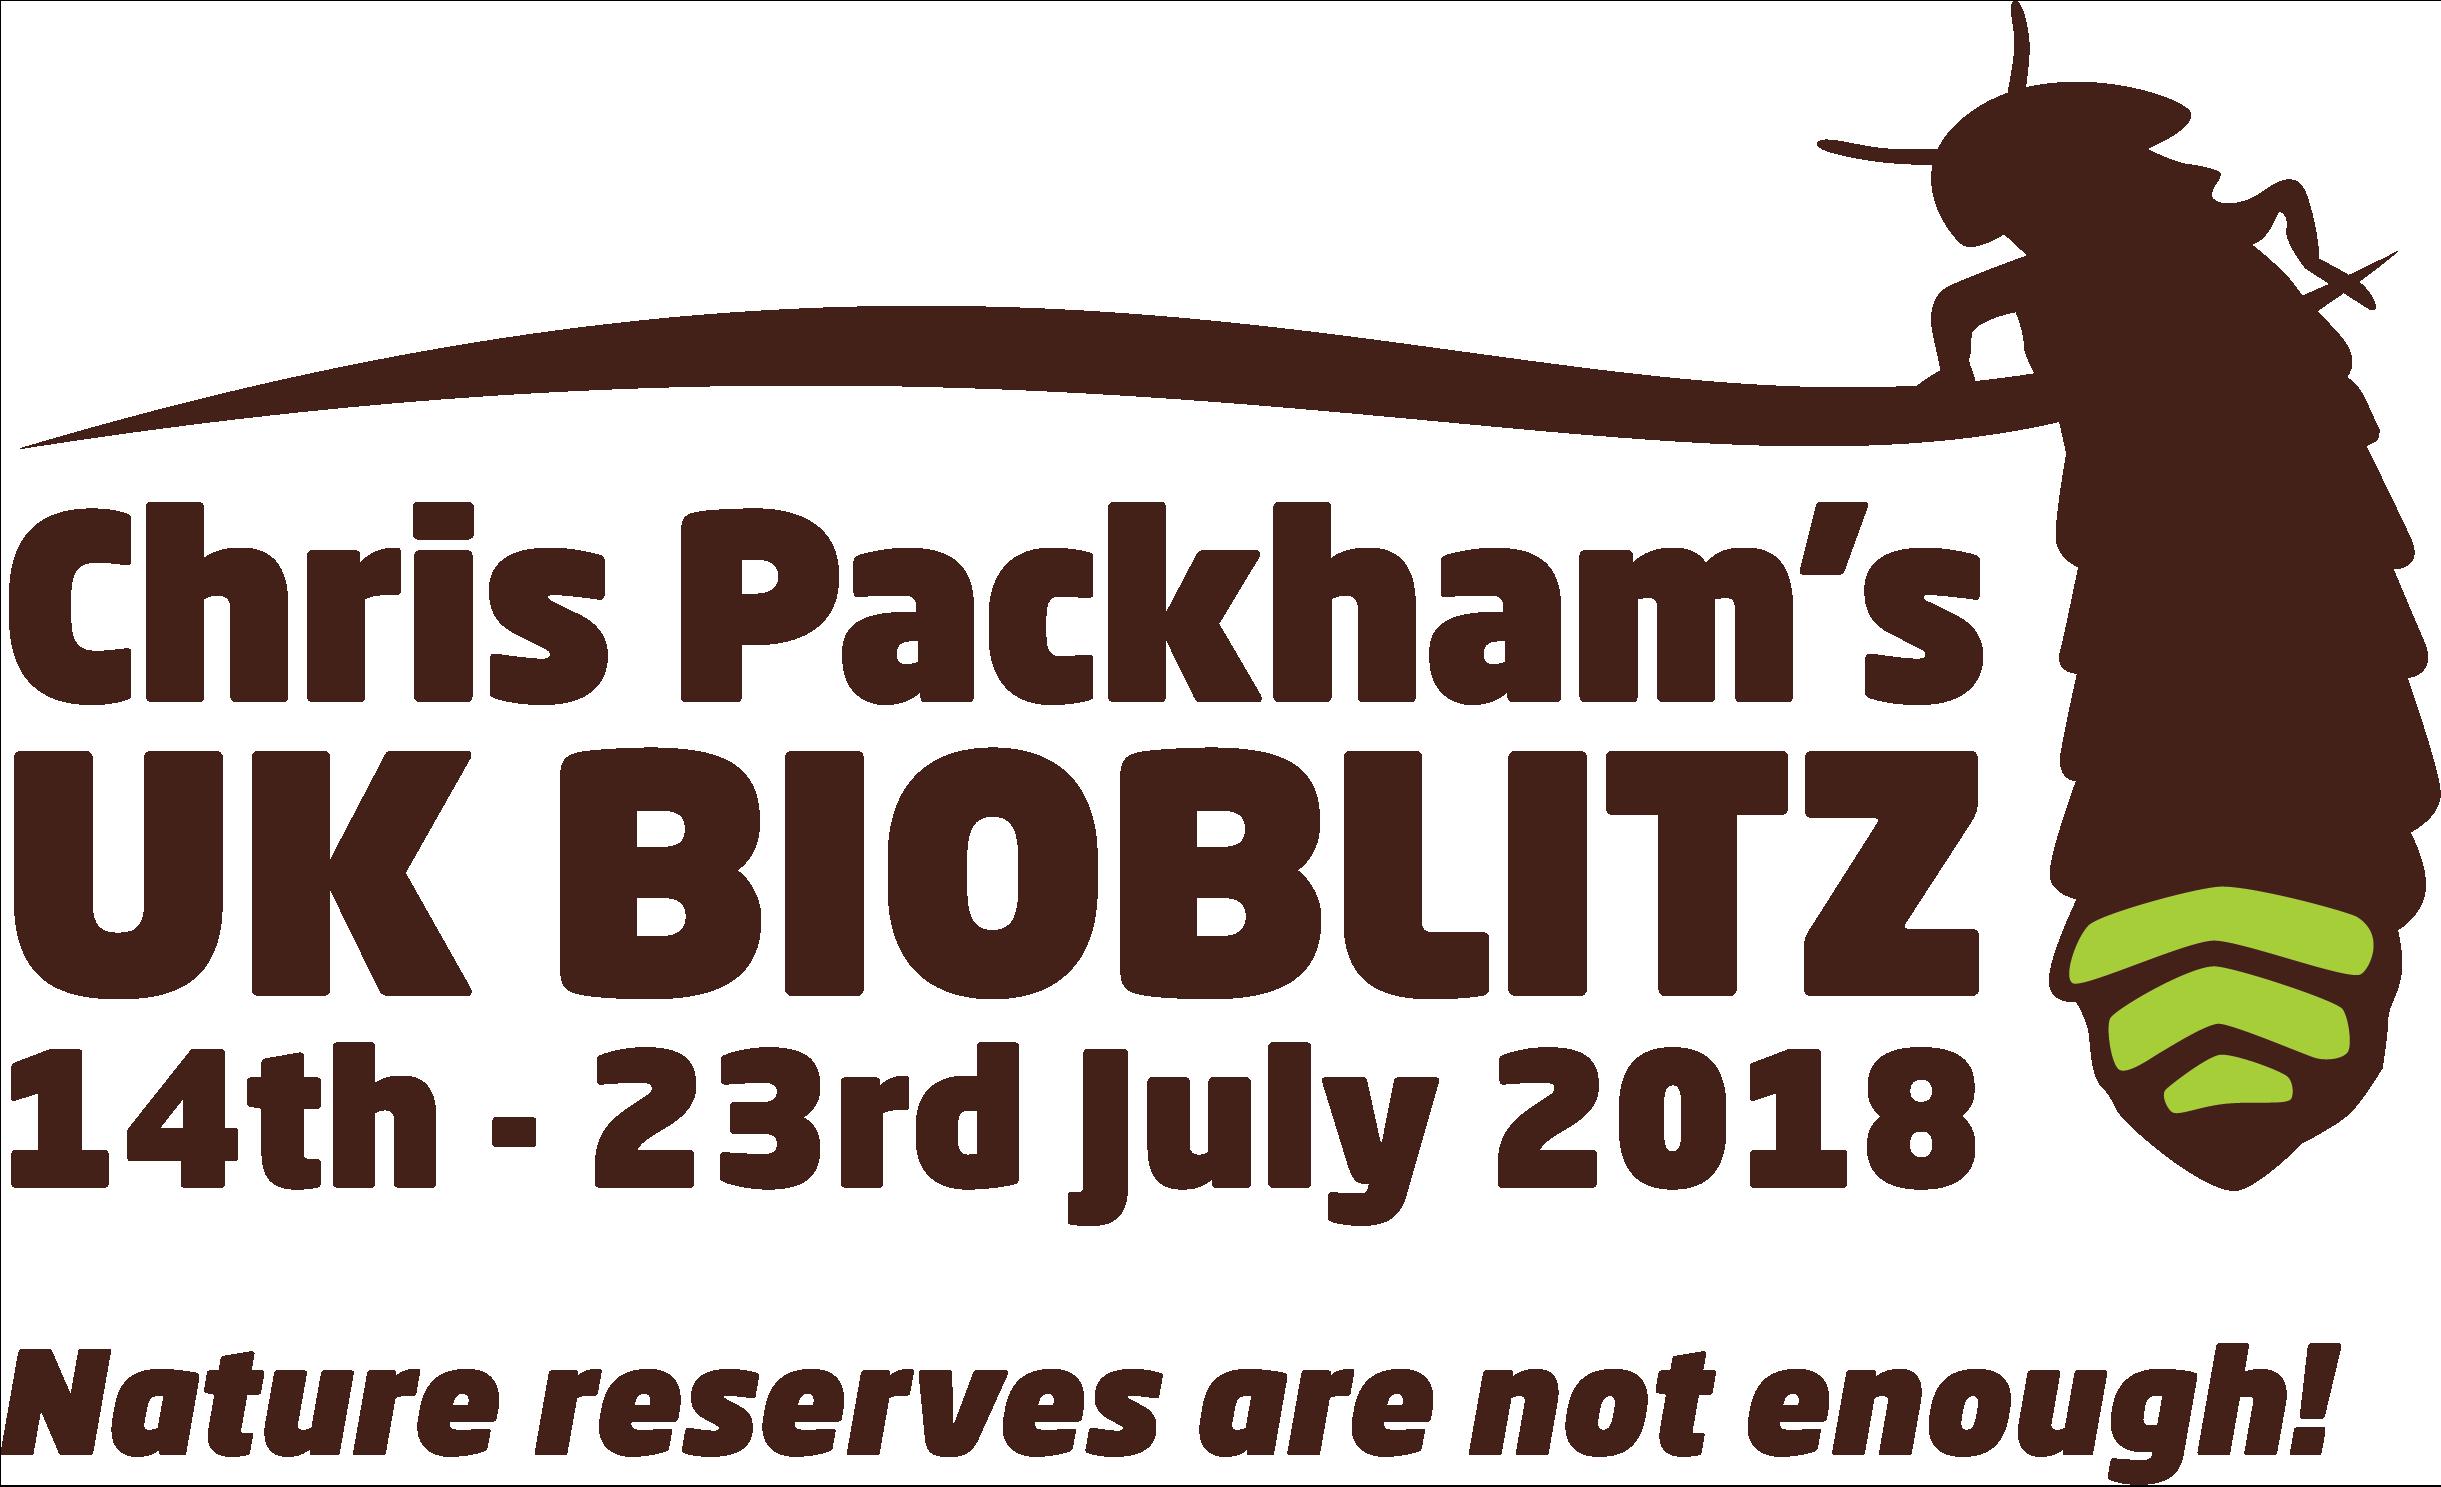 Chris Packham's UK Bioblitz Campaign